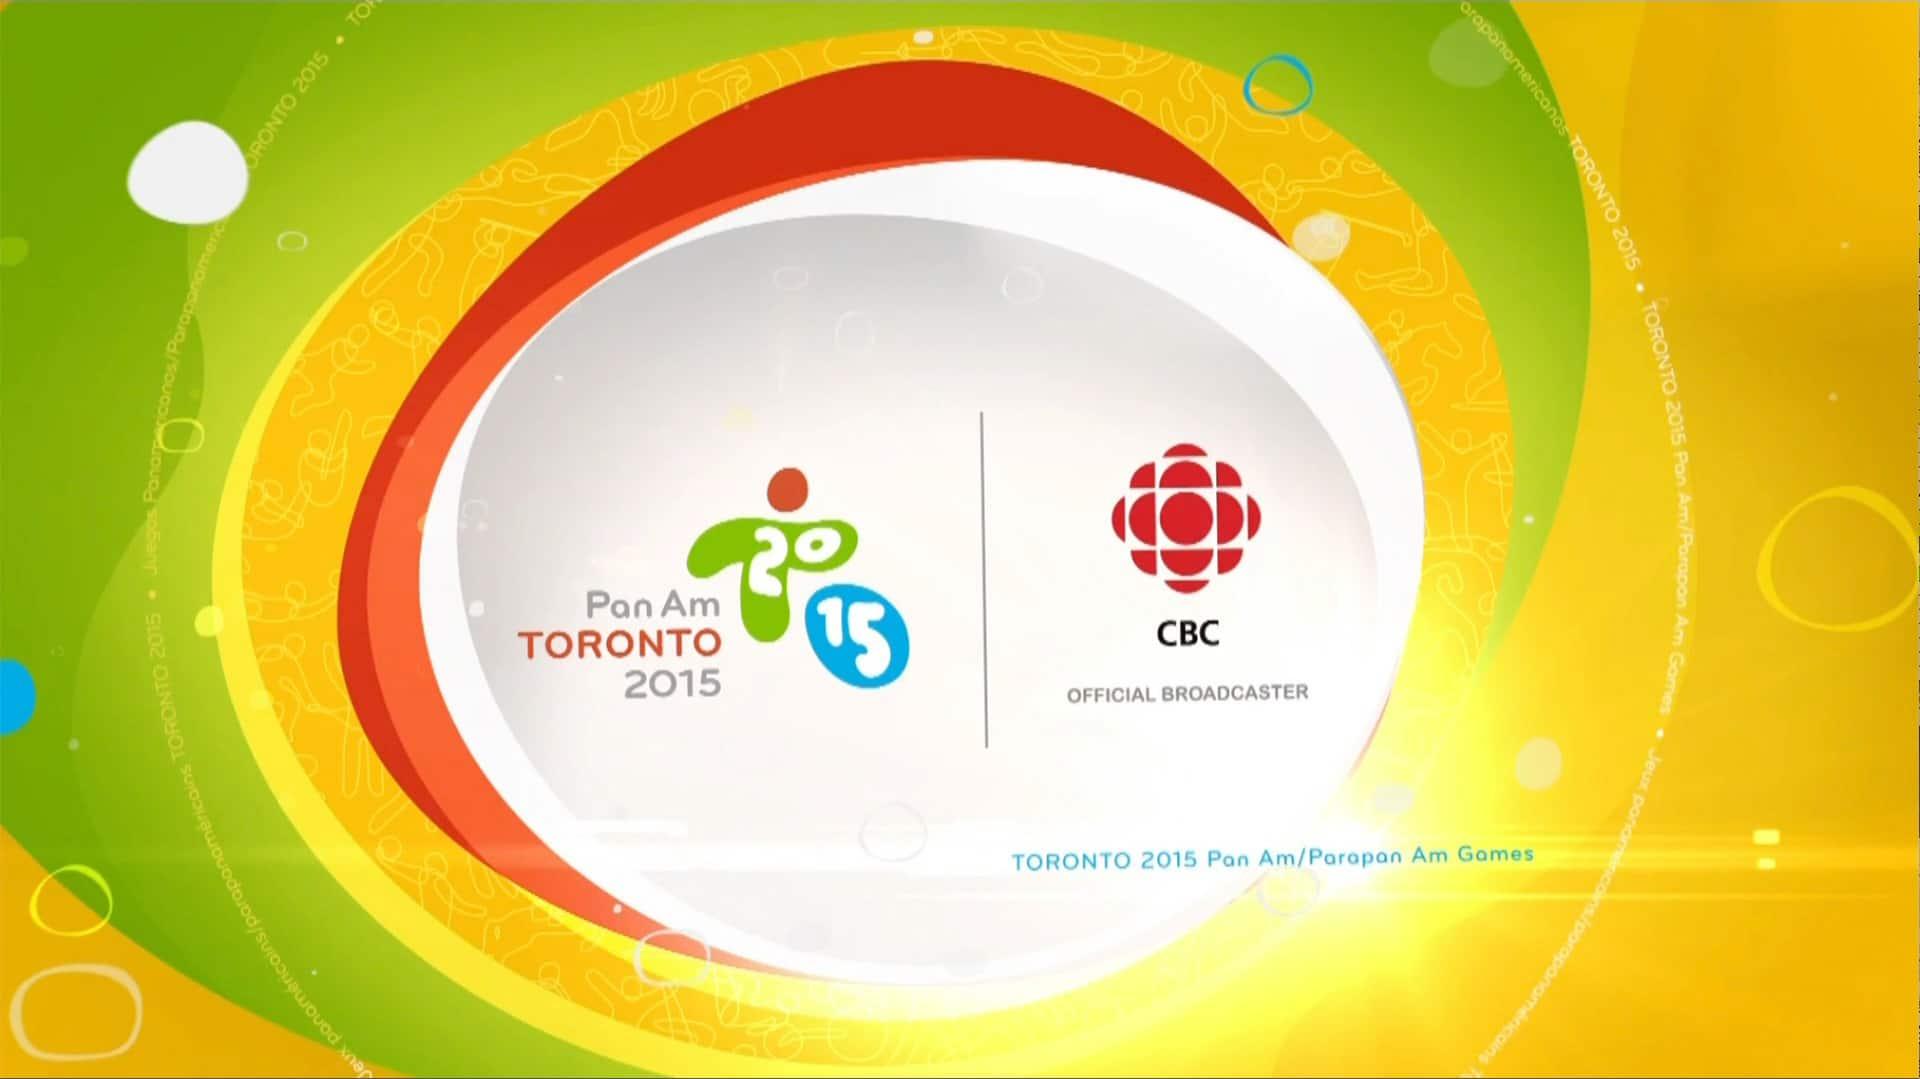 Graphic Design - CBC Production Facilities